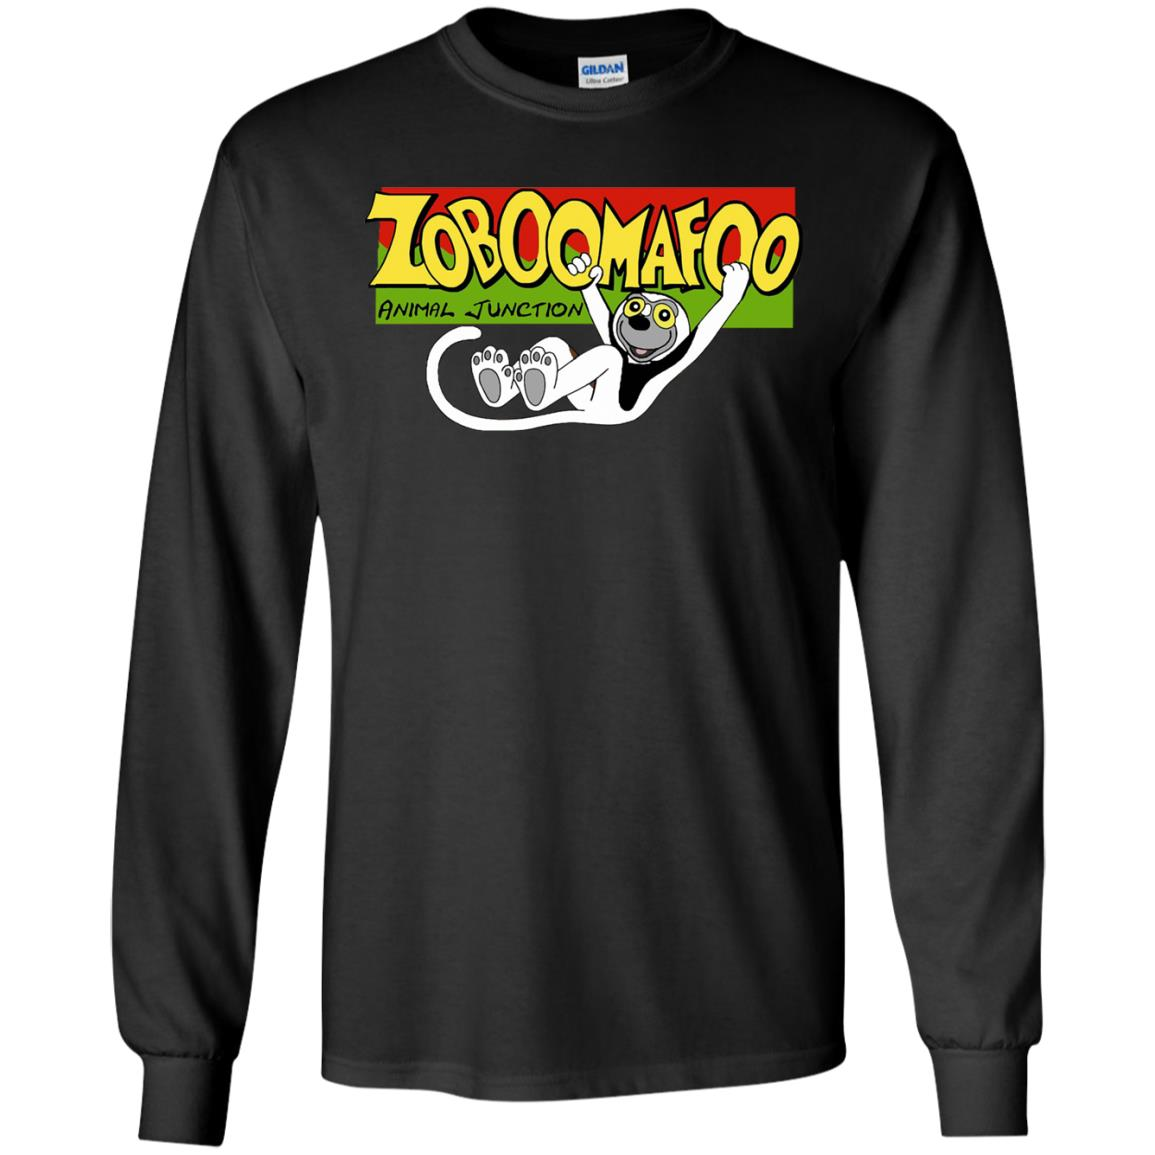 Zoboomafoo Shirt - 10% Off - FavorMerch